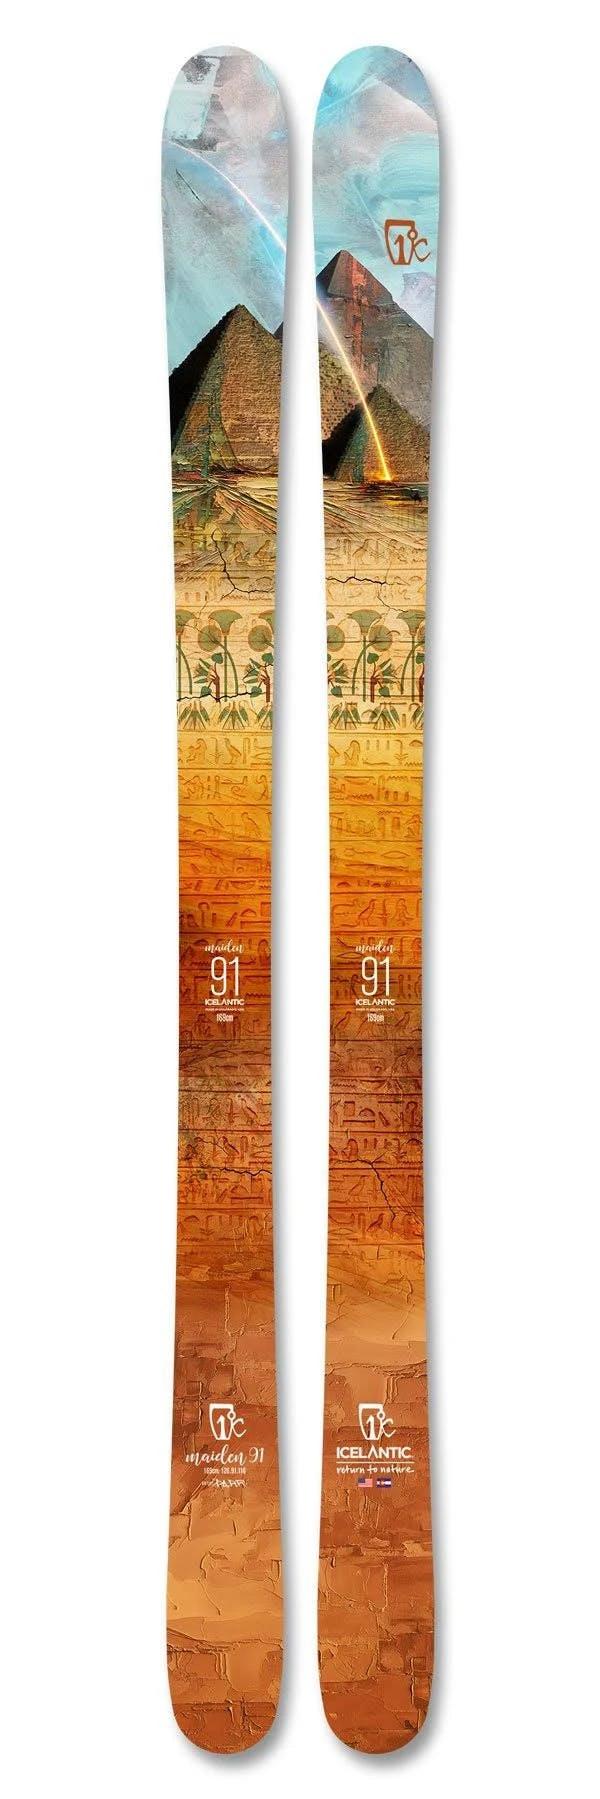 Icelantic Maiden 91 Women's Skis · 2021